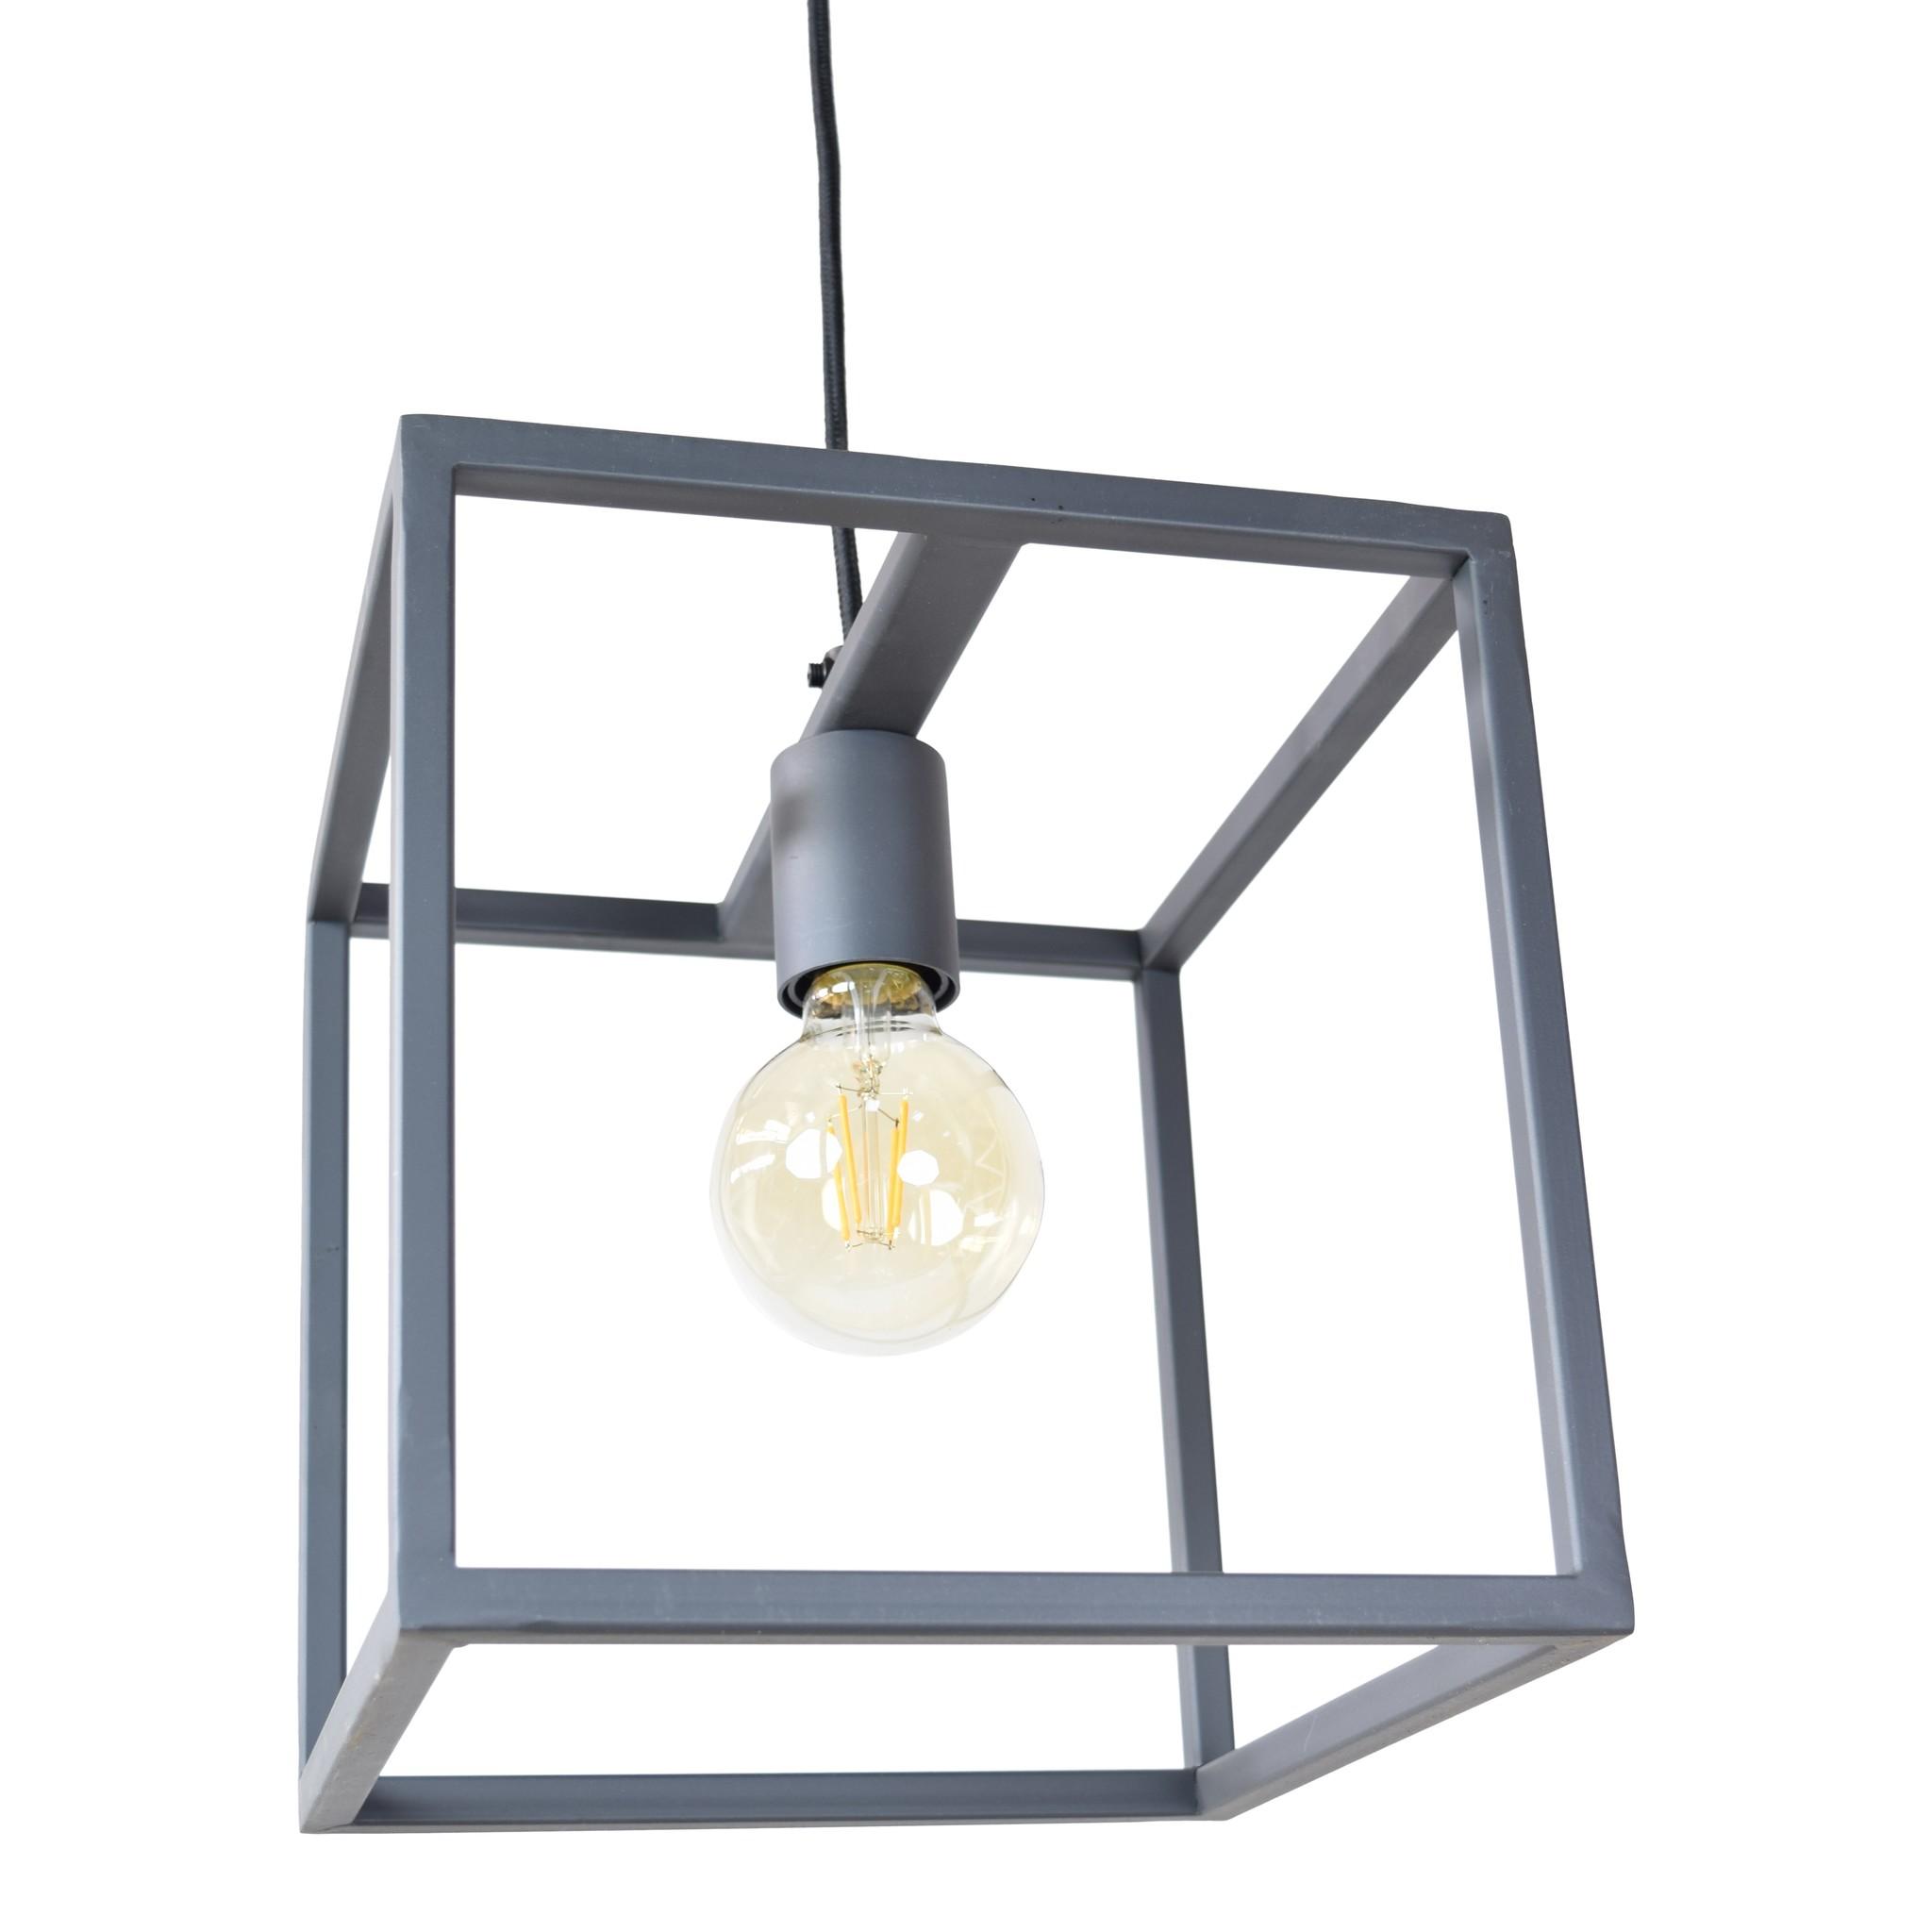 Urban Interiors Urban Interiors Hanglamp Frame 25x25 Zwart